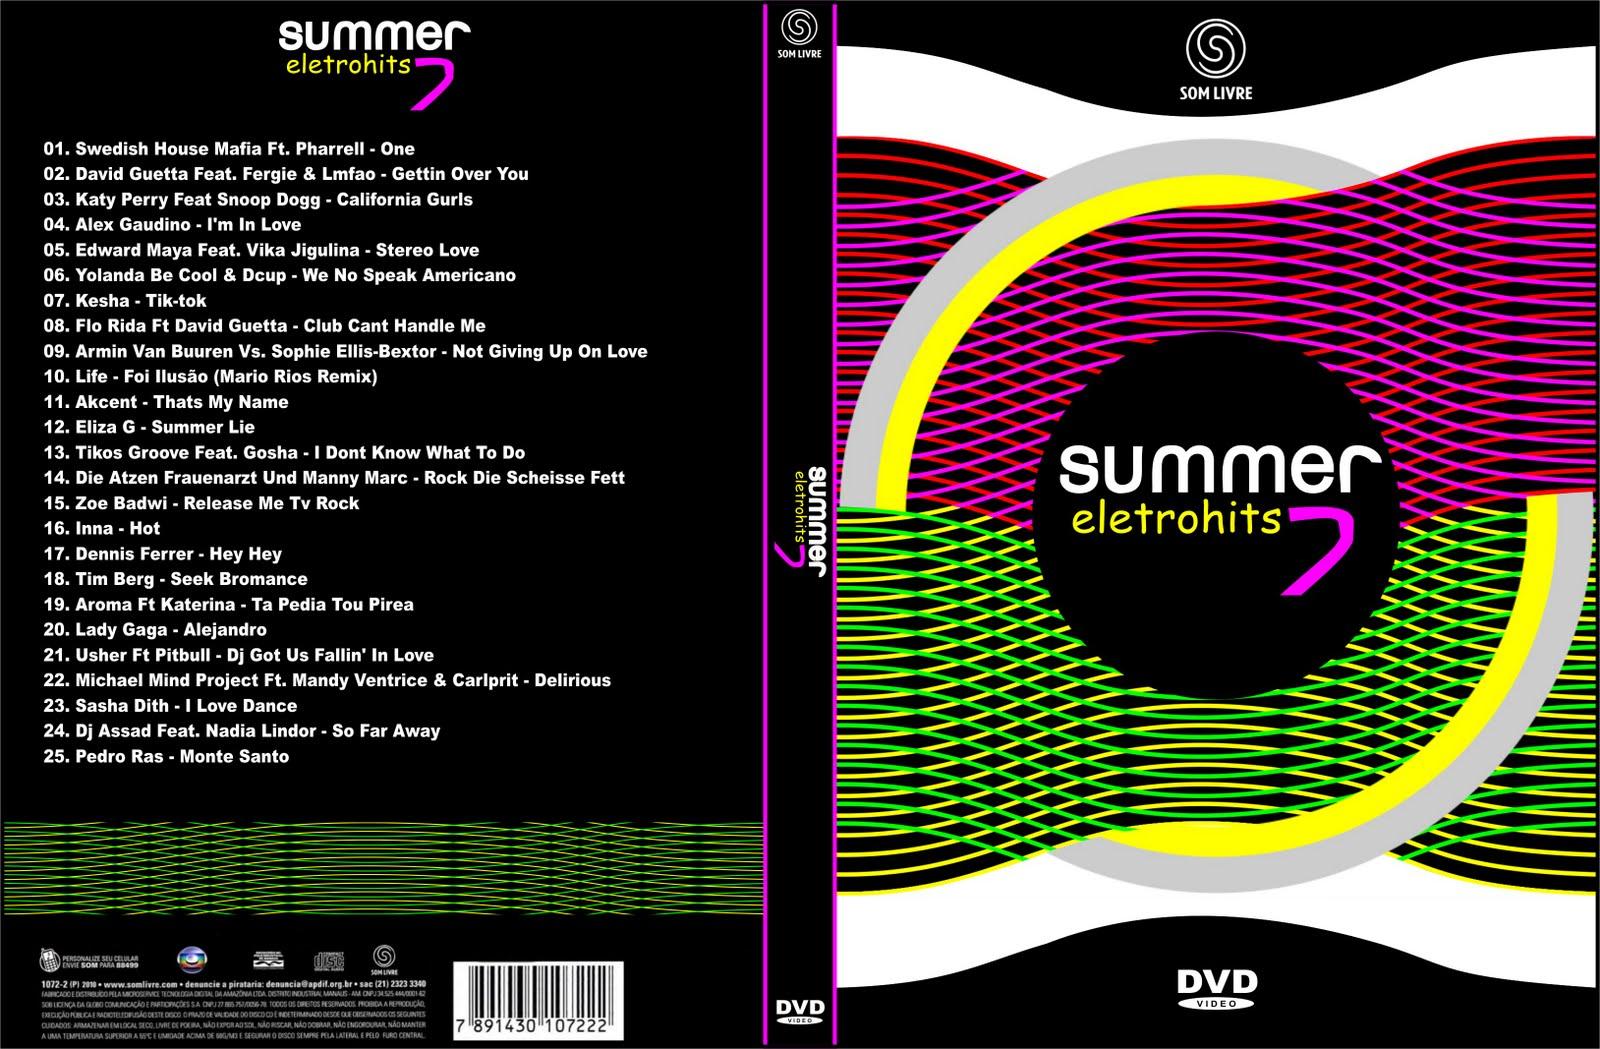 cds gratis summer eletrohits 7